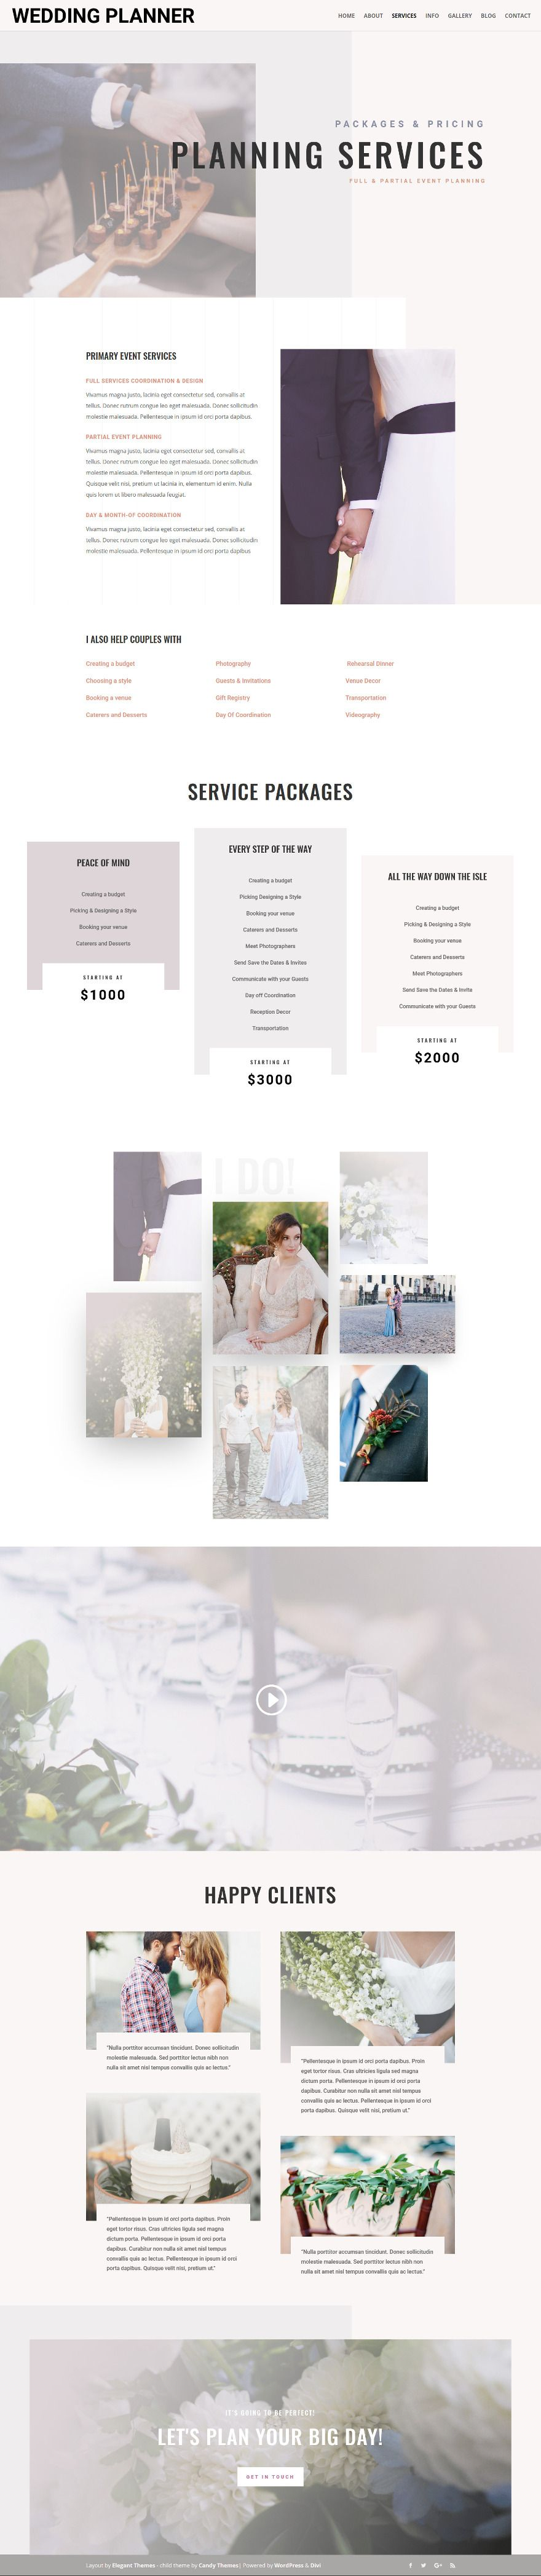 Wedding Planner Divi child theme allows you to create an elegant ...